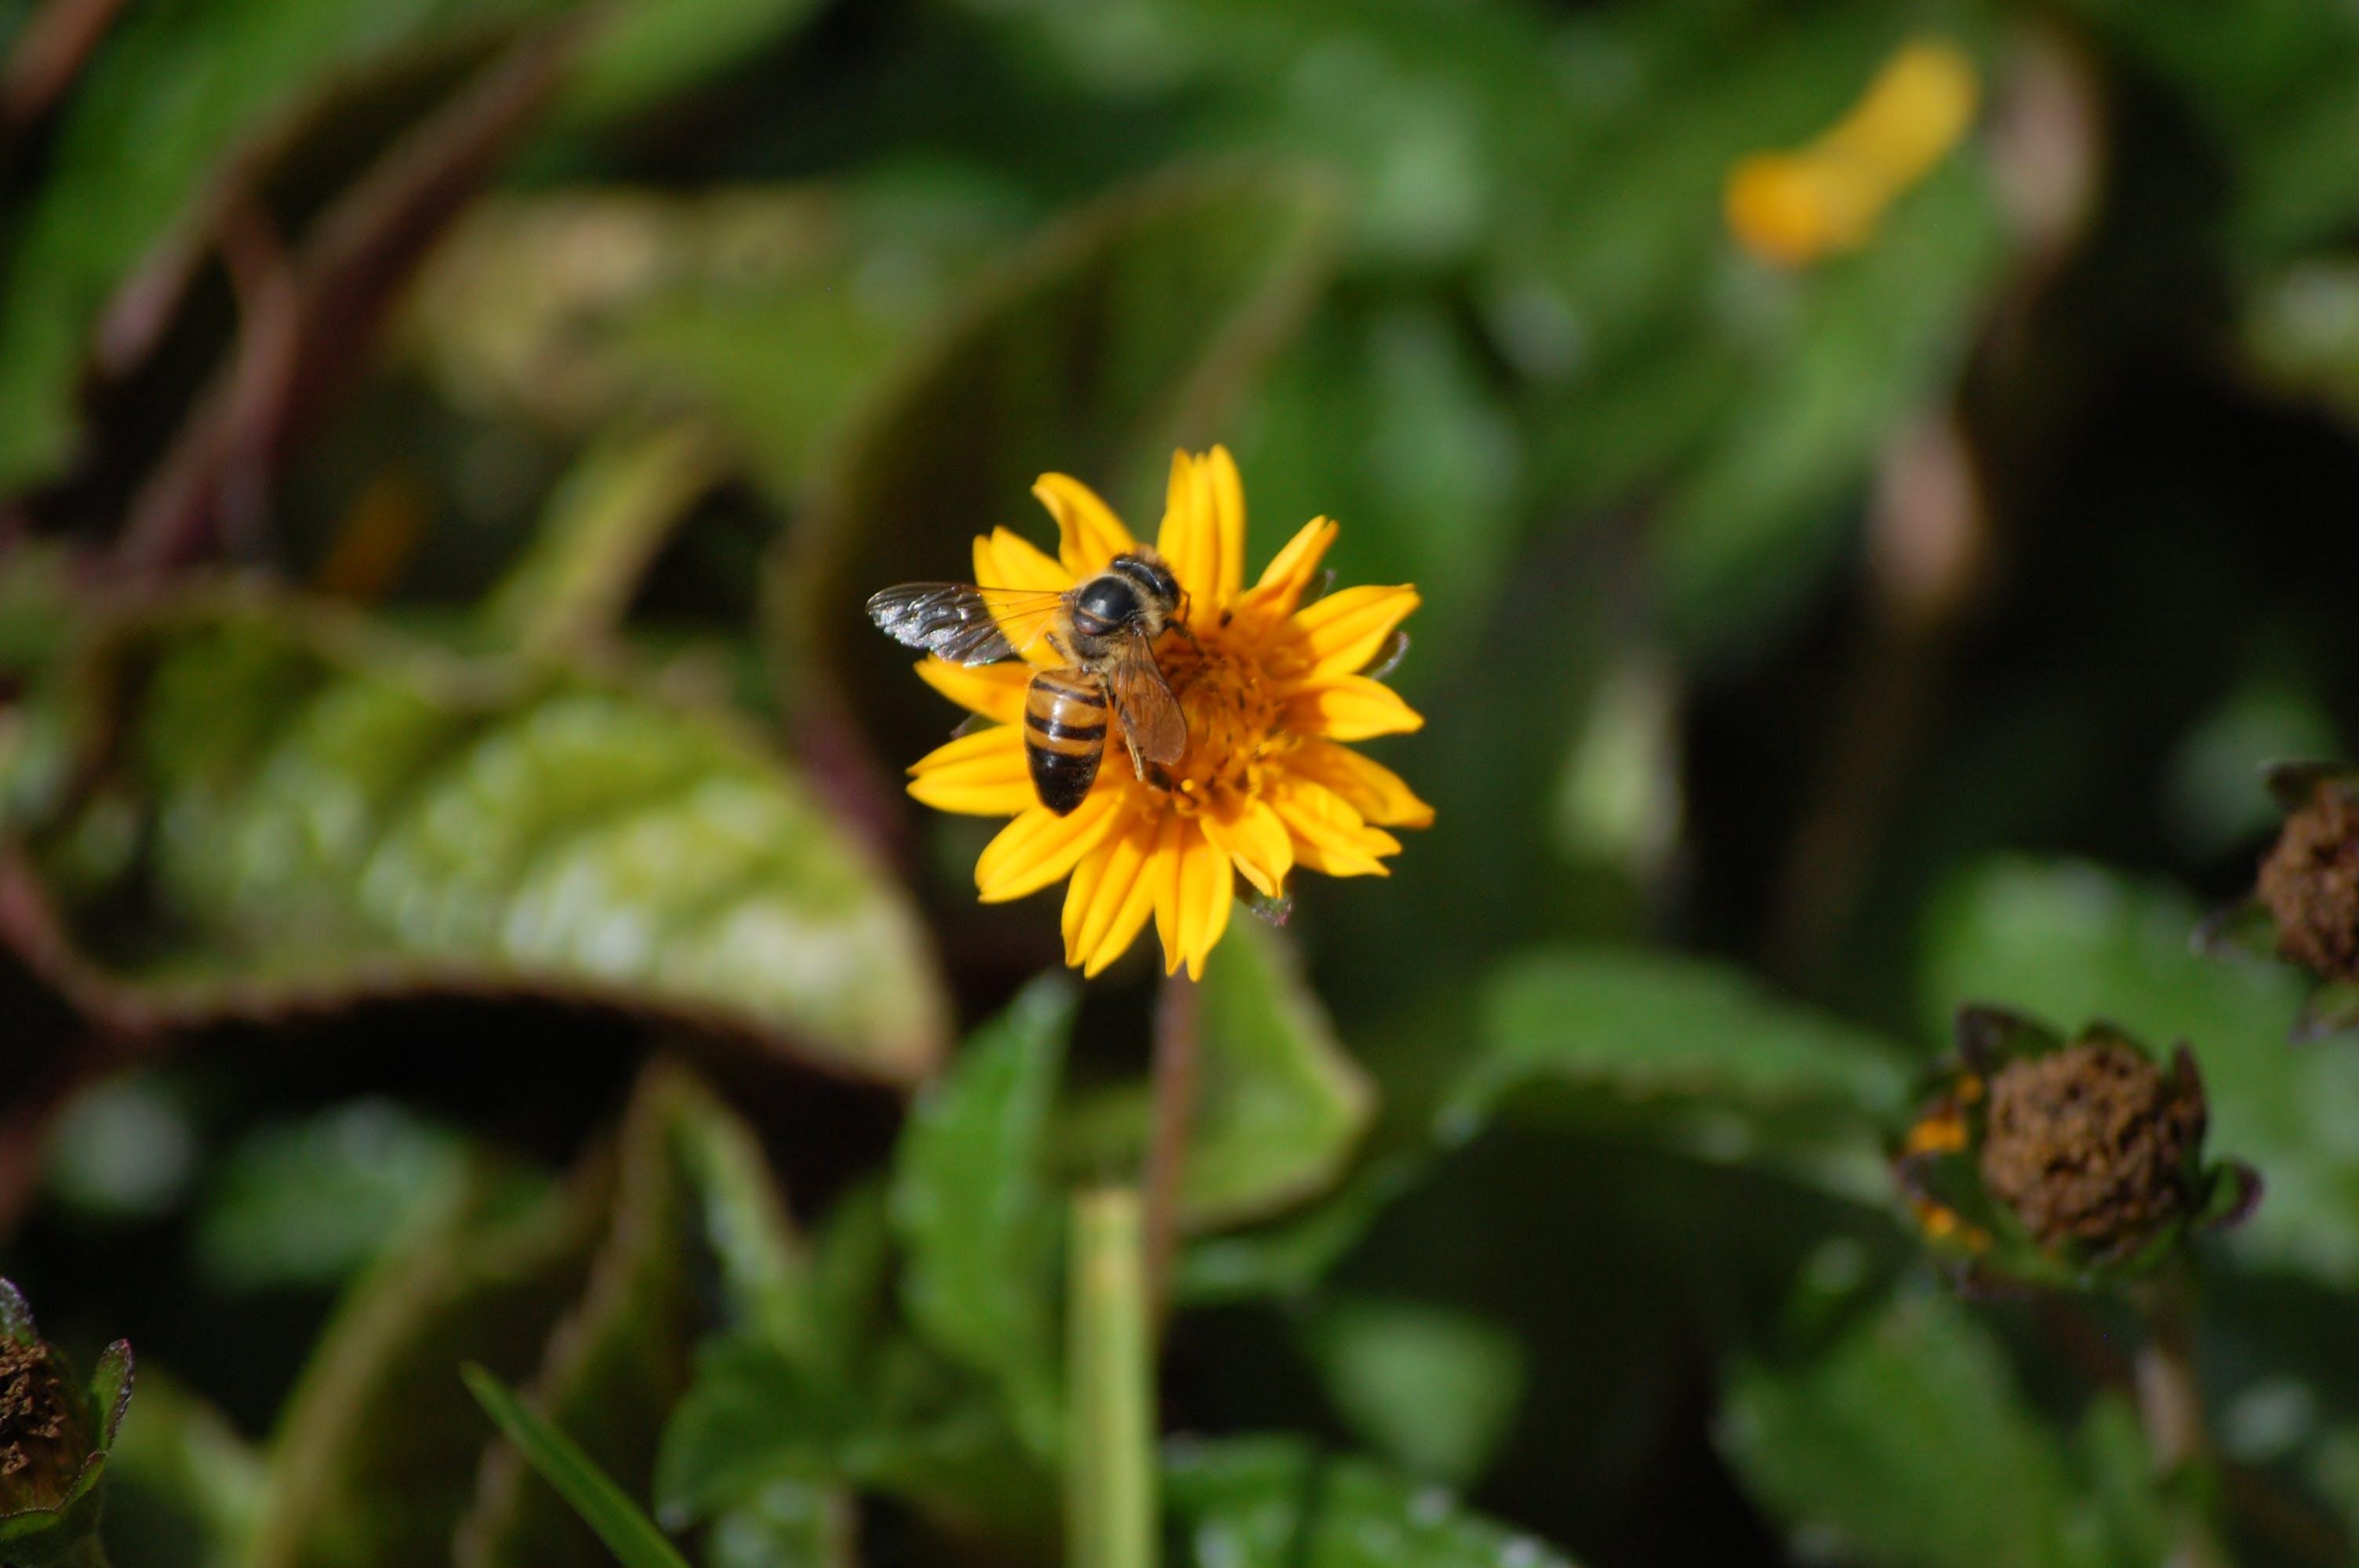 Free stock photo of bee, taking nectar